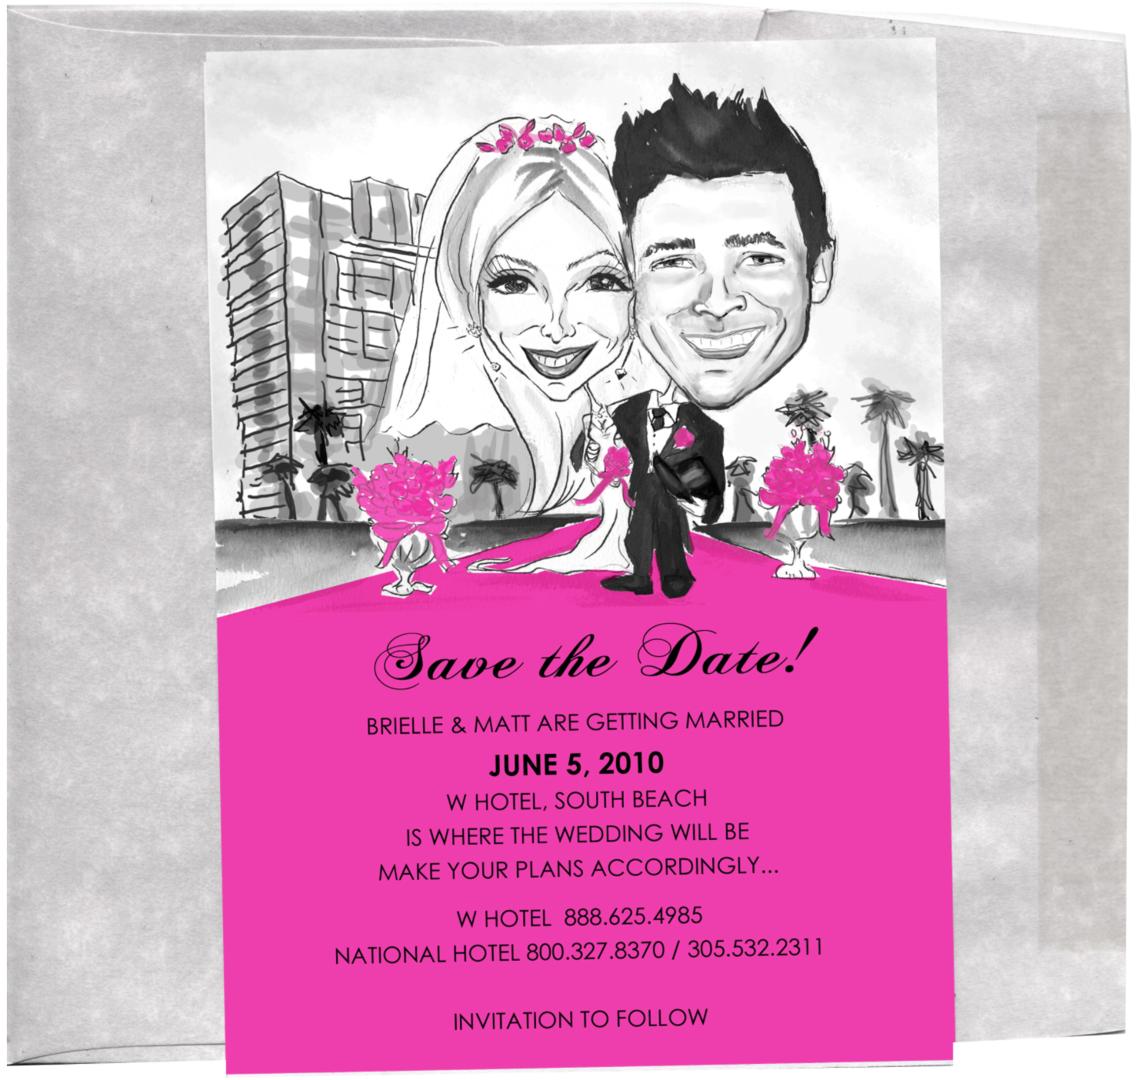 Unique custom caricature wedding bridal party invitations custom httpstwitternysketches filmwisefo Images